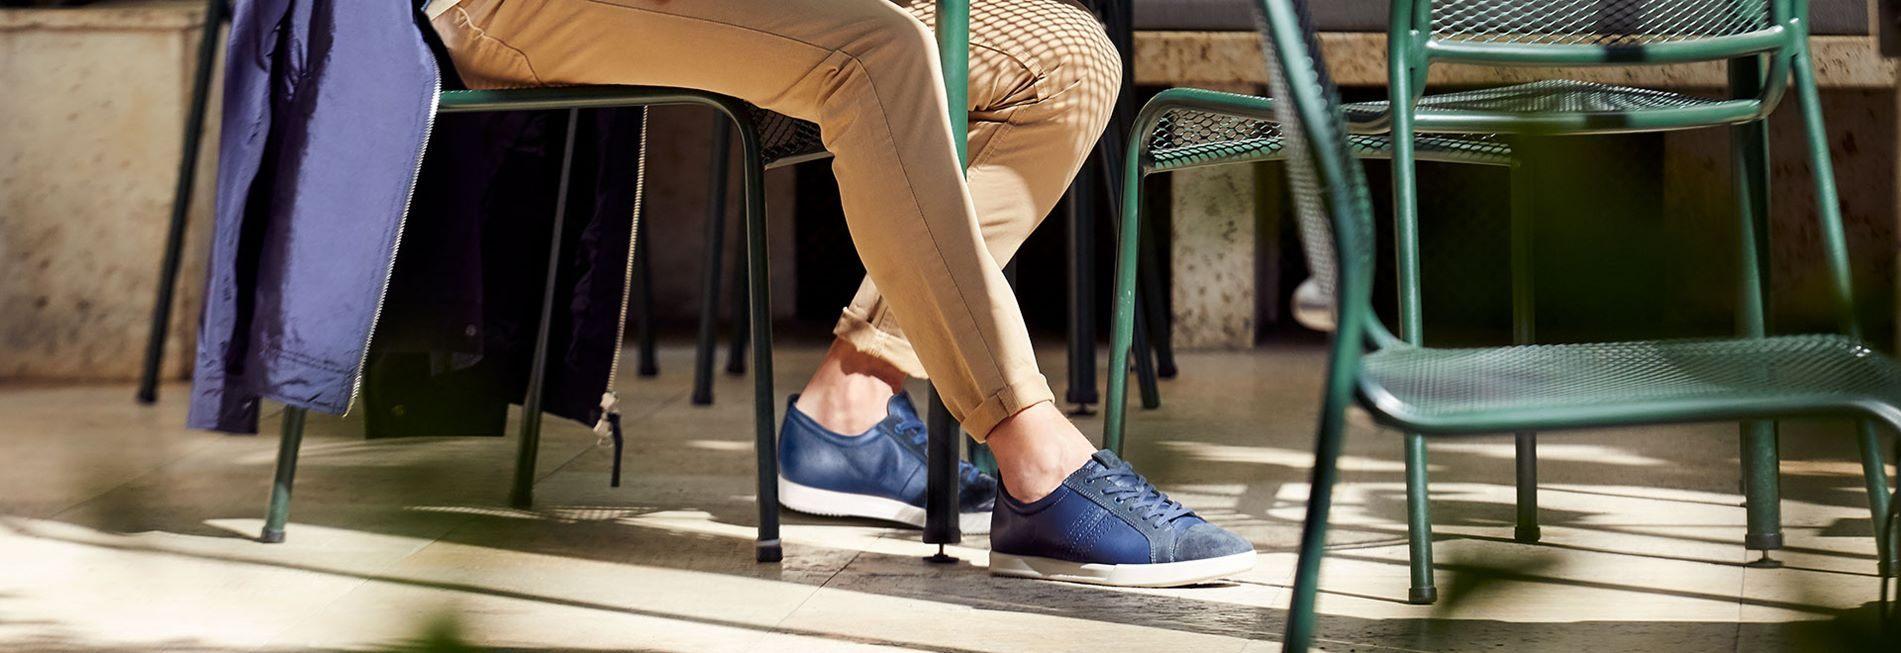 Lit Led 160×200 Beau Ecco is A Global Leader In Innovative fort Footwear for Men